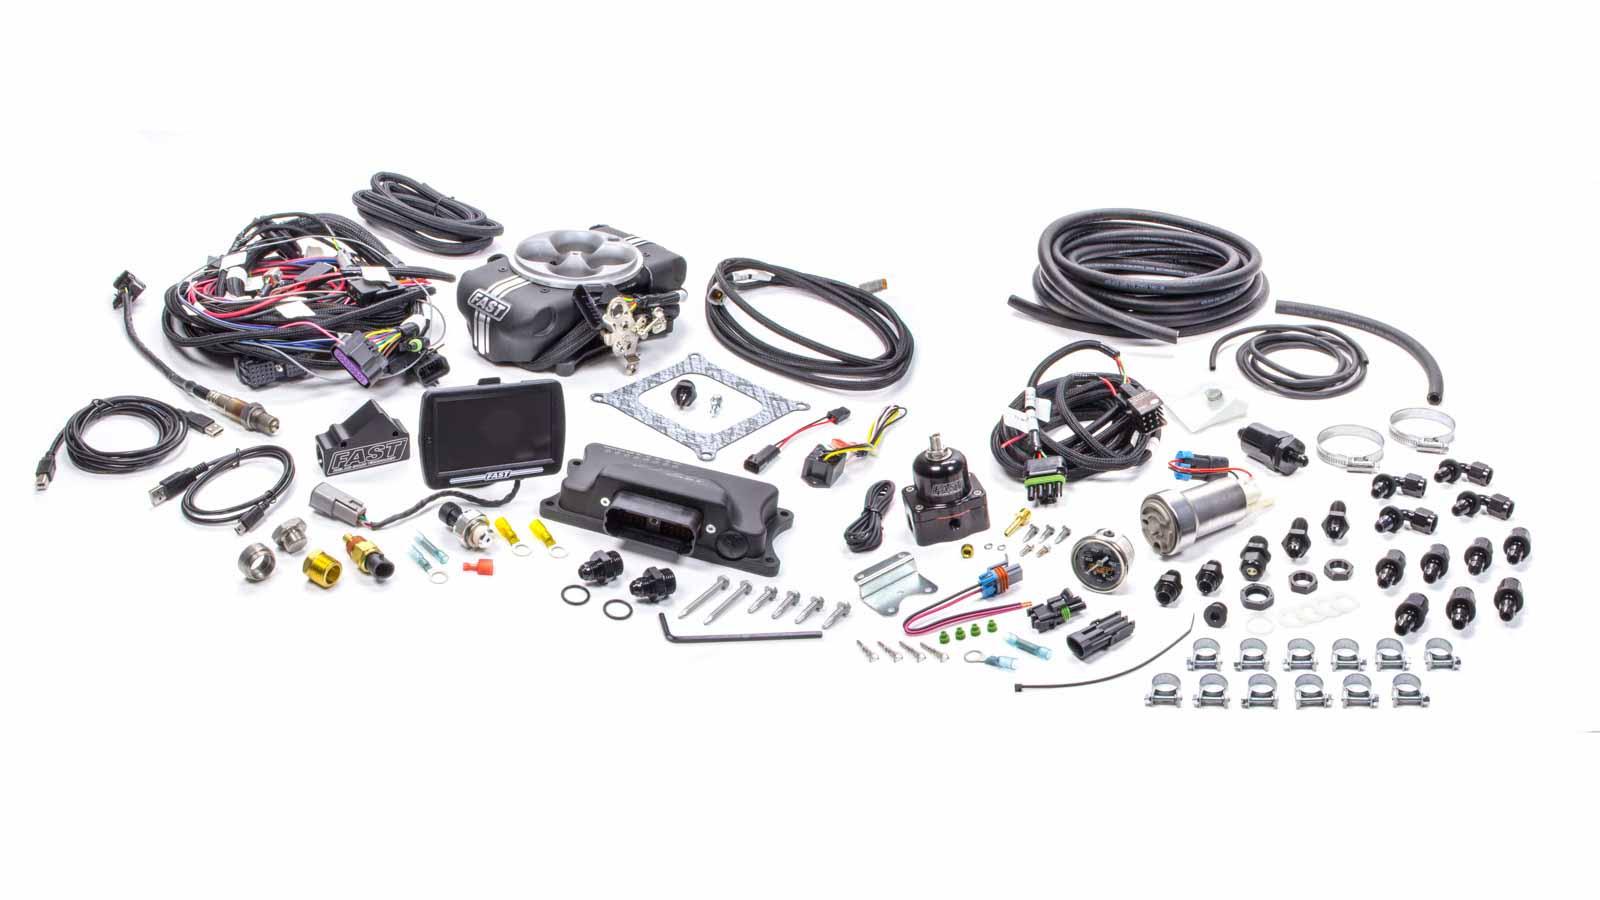 Fast Electronics Cfm Ez Efi 2 0 Master Fuel Injection